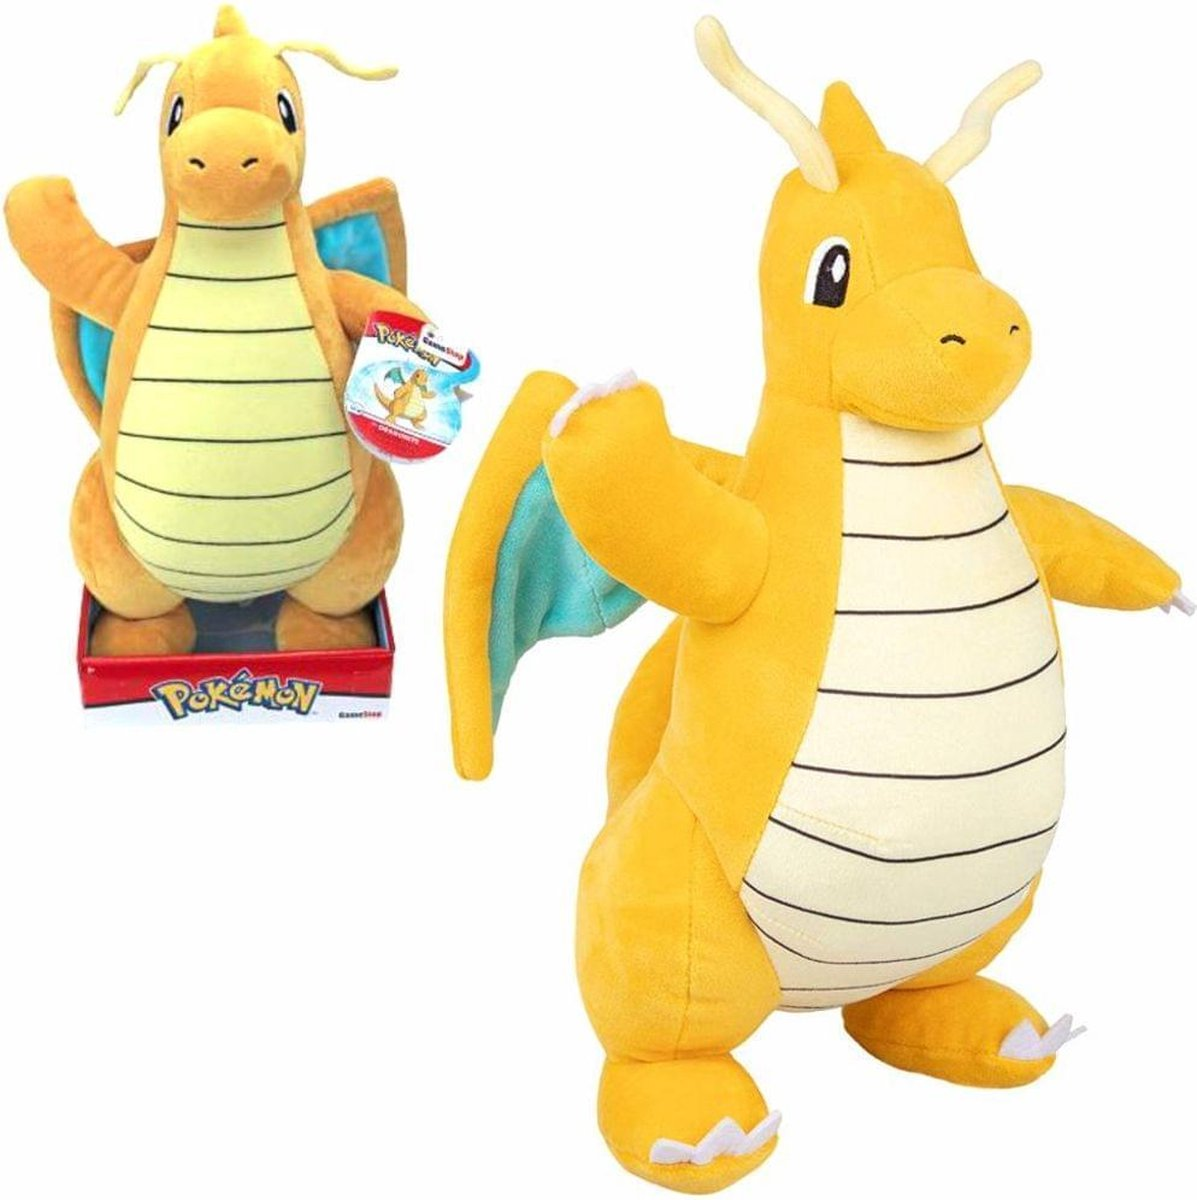 Pokémon Pluche - Dragonite Knuffel 32 cm - Charmander - Charizard - Dragon - Draak - Dragonite